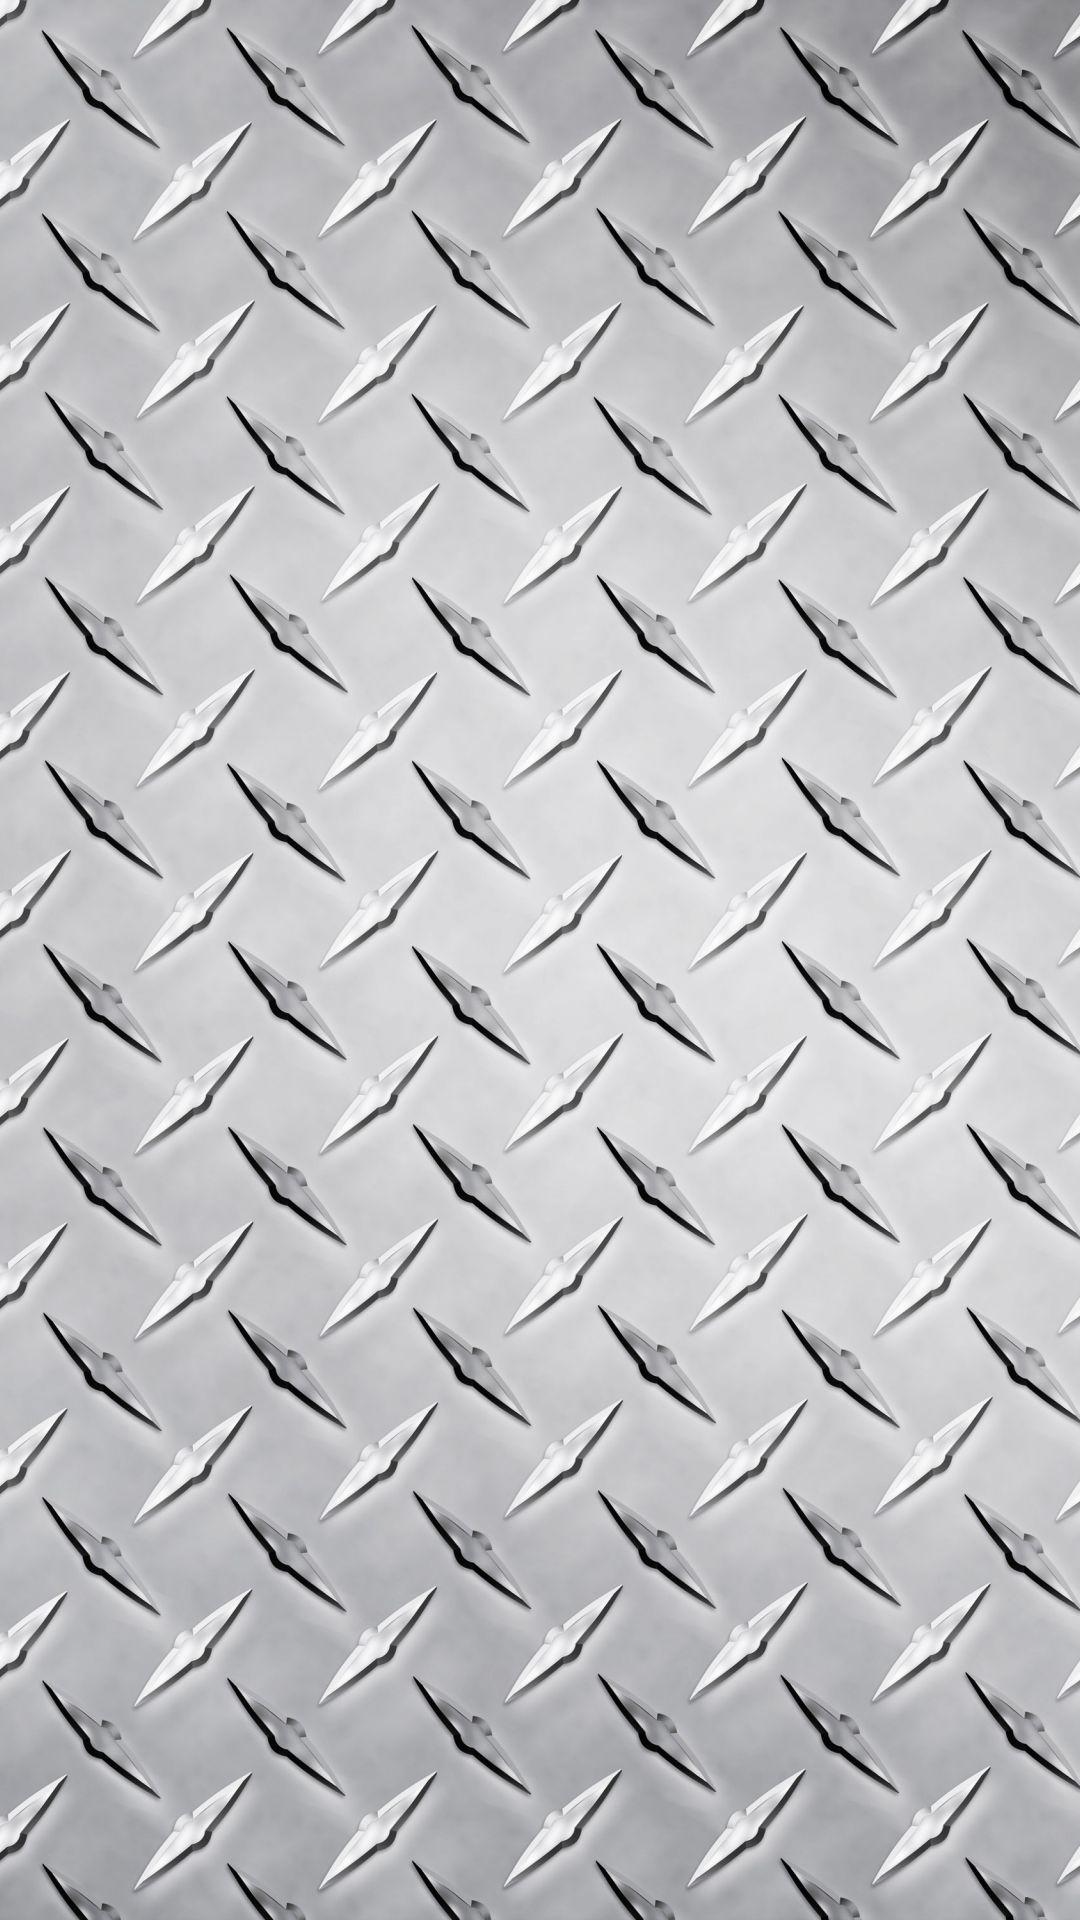 Shiny Silver Wallpaper